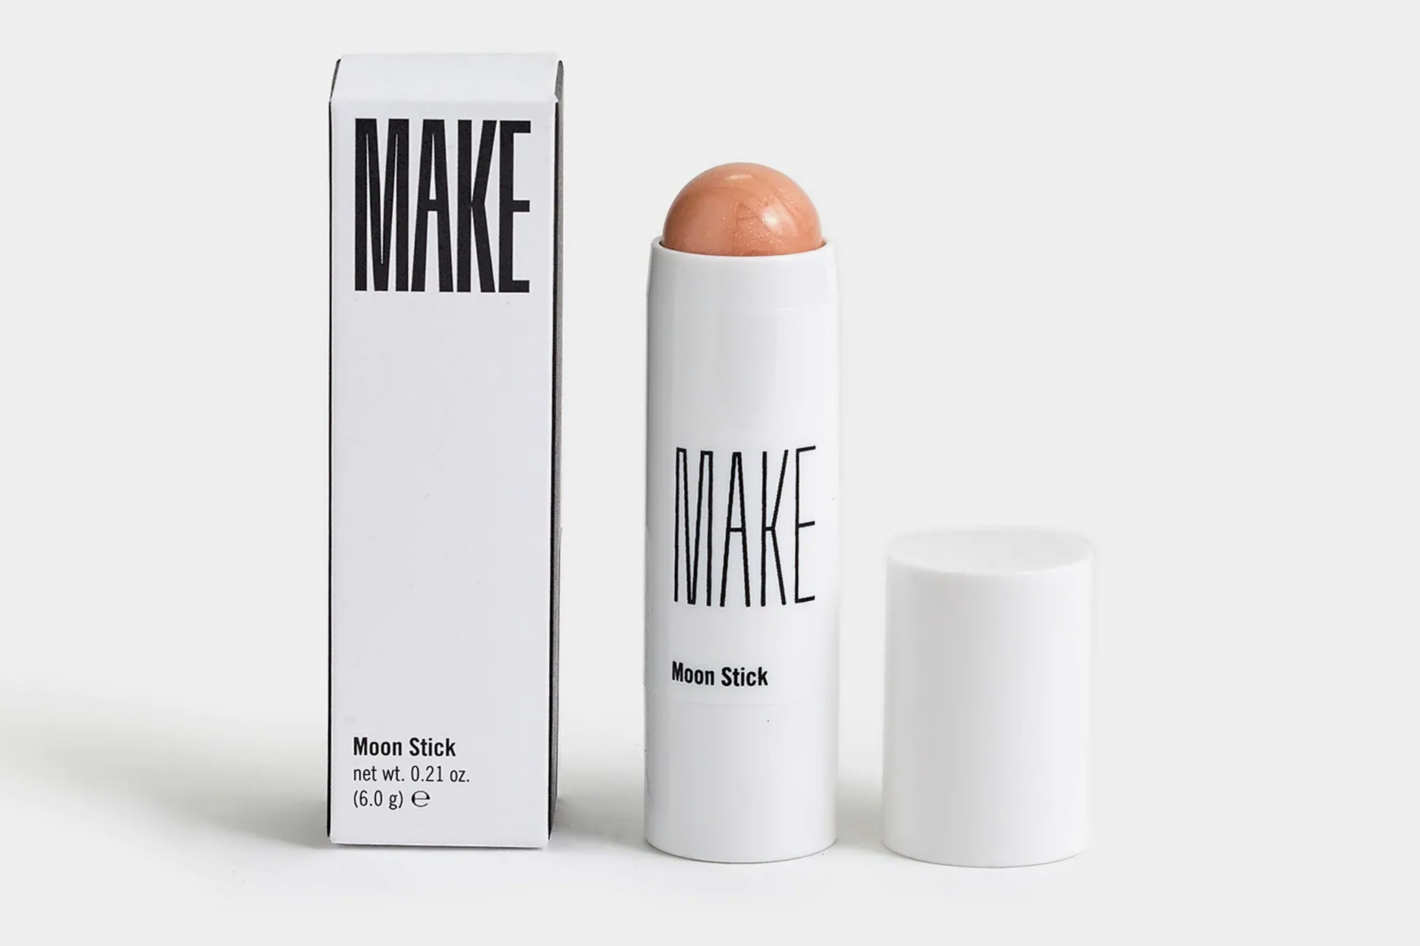 Make Moon Stick